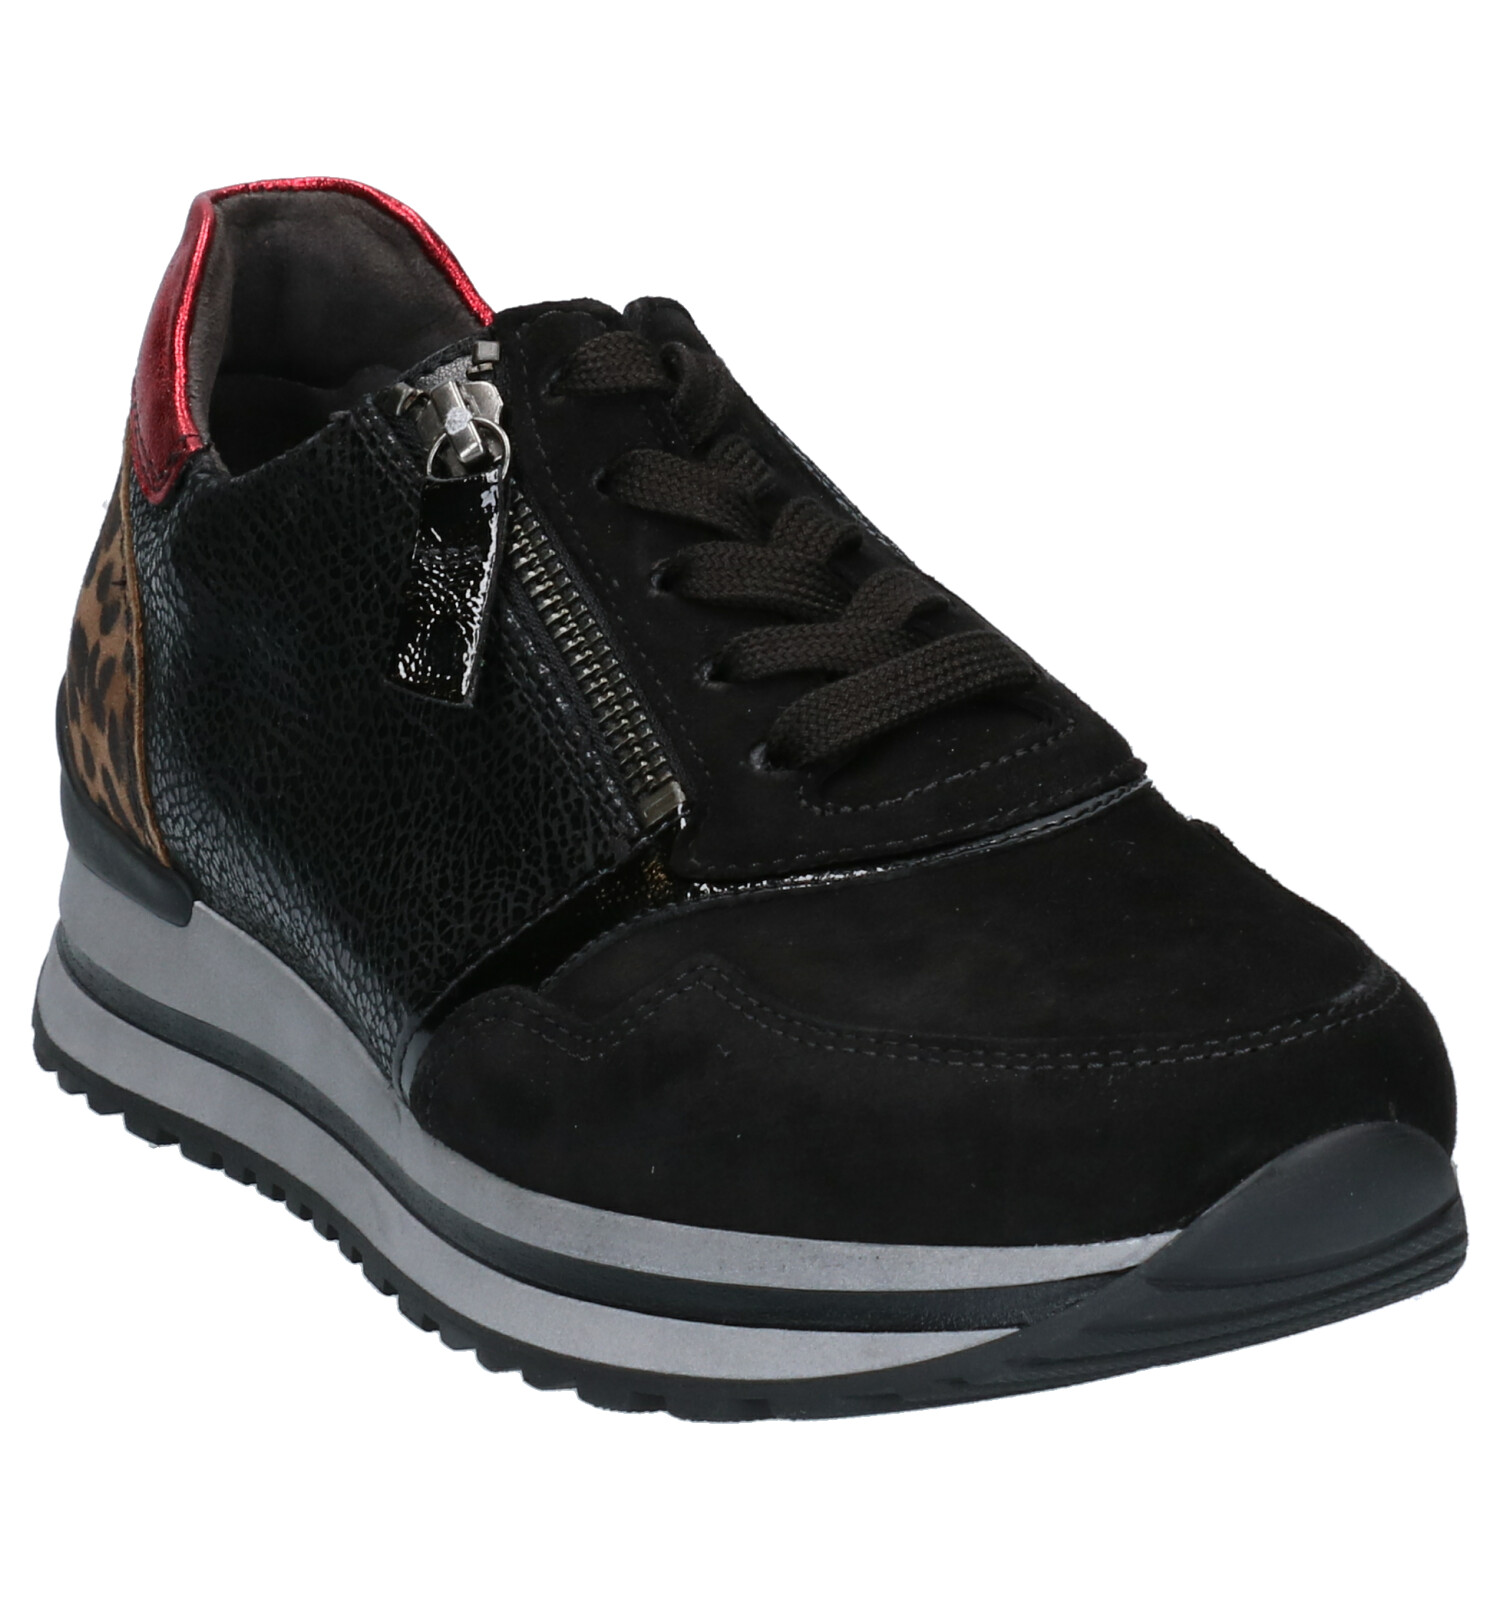 Optifit Gabor Sneakers Optifit Gabor Optifit Gabor Zwarte Zwarte Zwarte Sneakers Sneakers qUzVGSMp